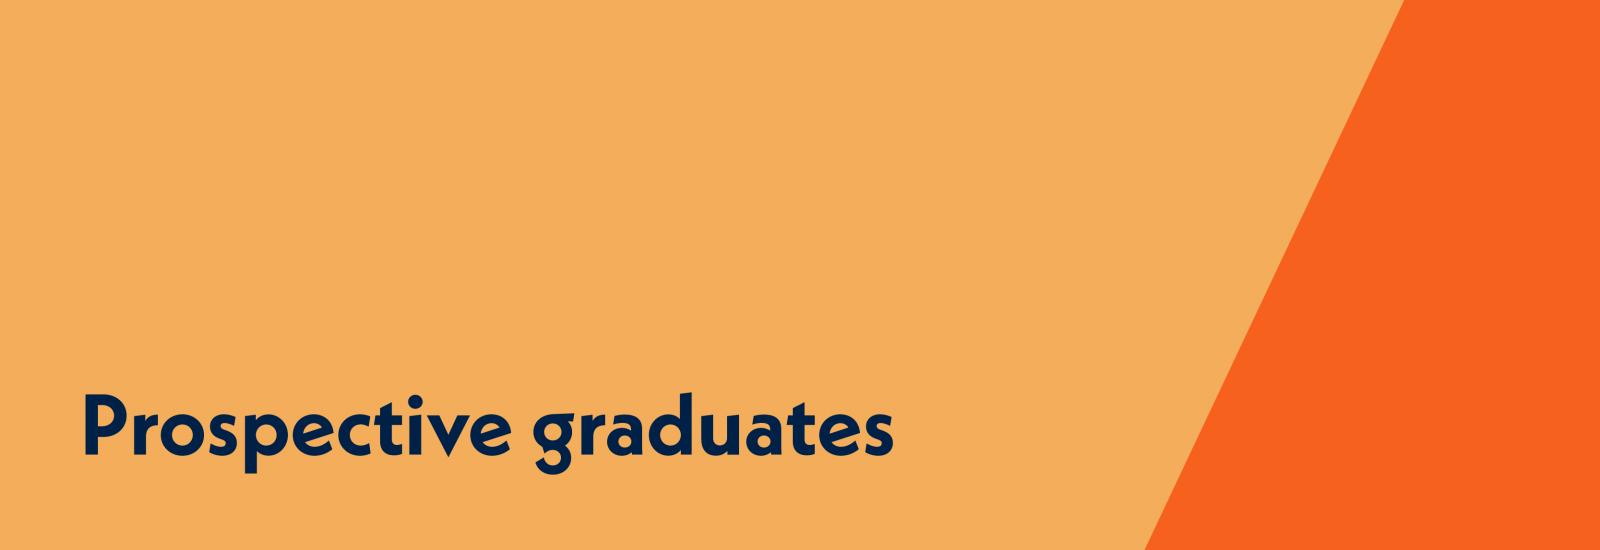 Prospective graduates